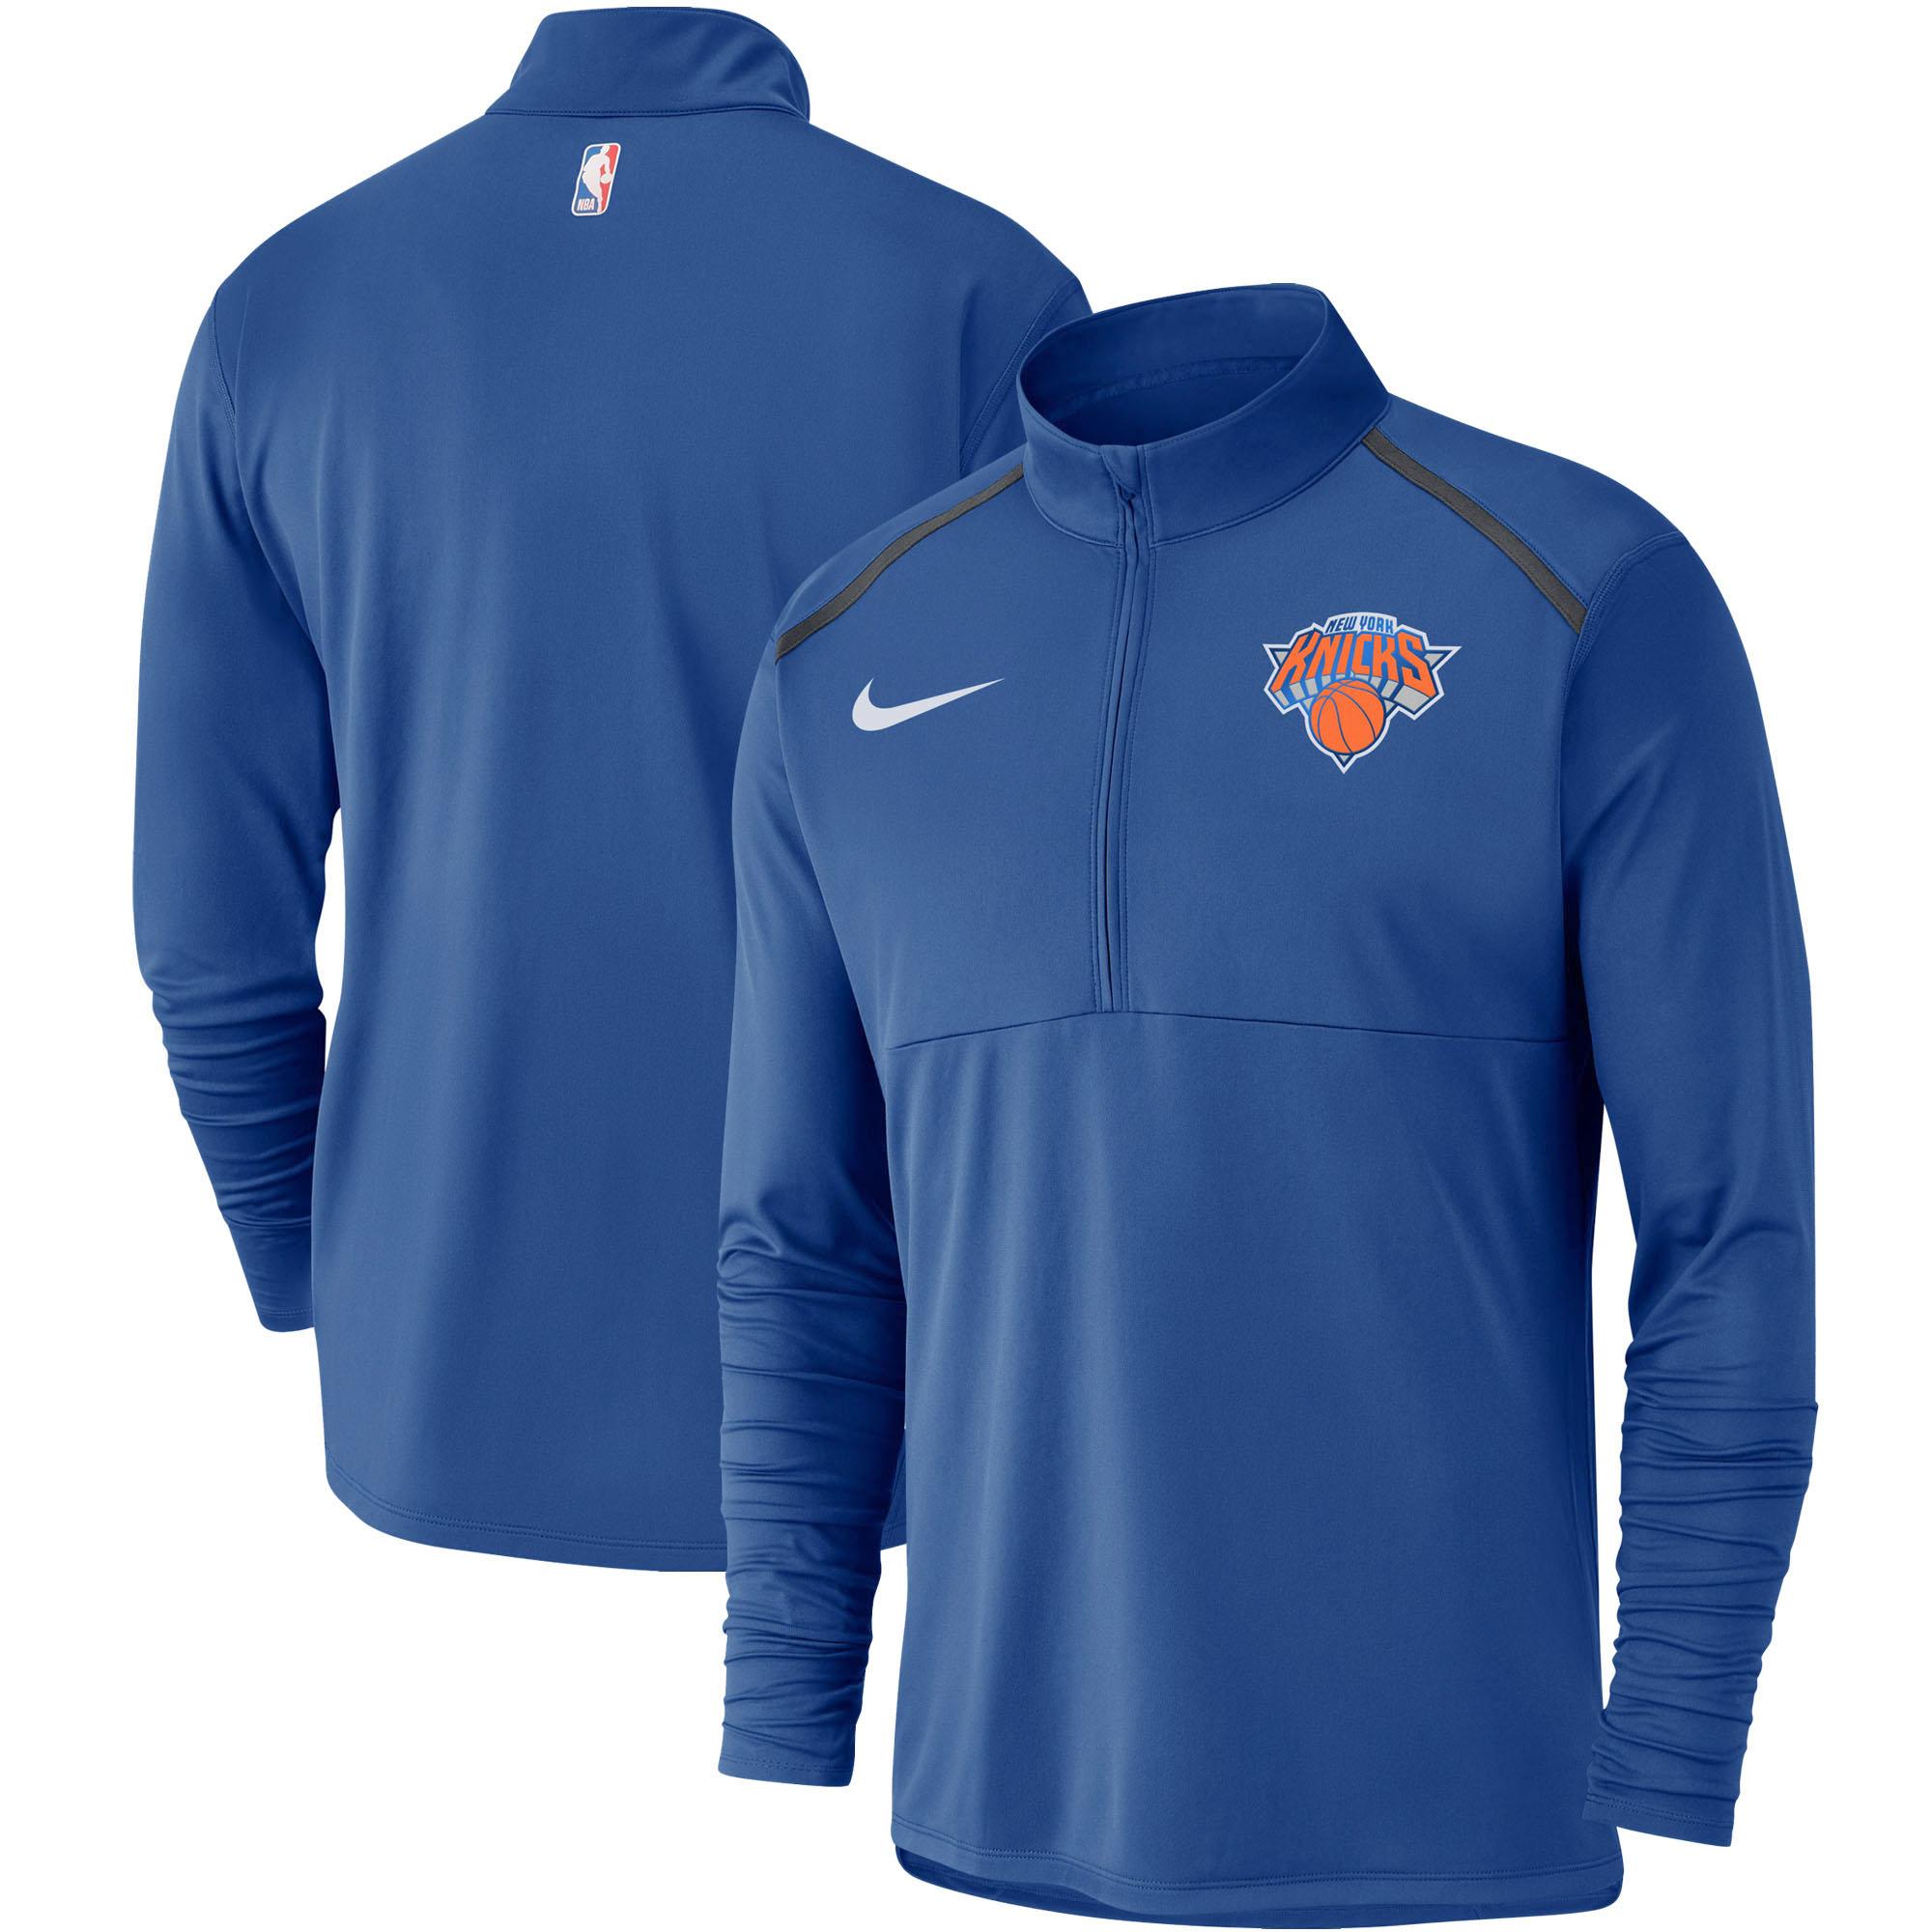 New York Knicks Nike Element Performance Half-Zip Pullover Jacket - Blue